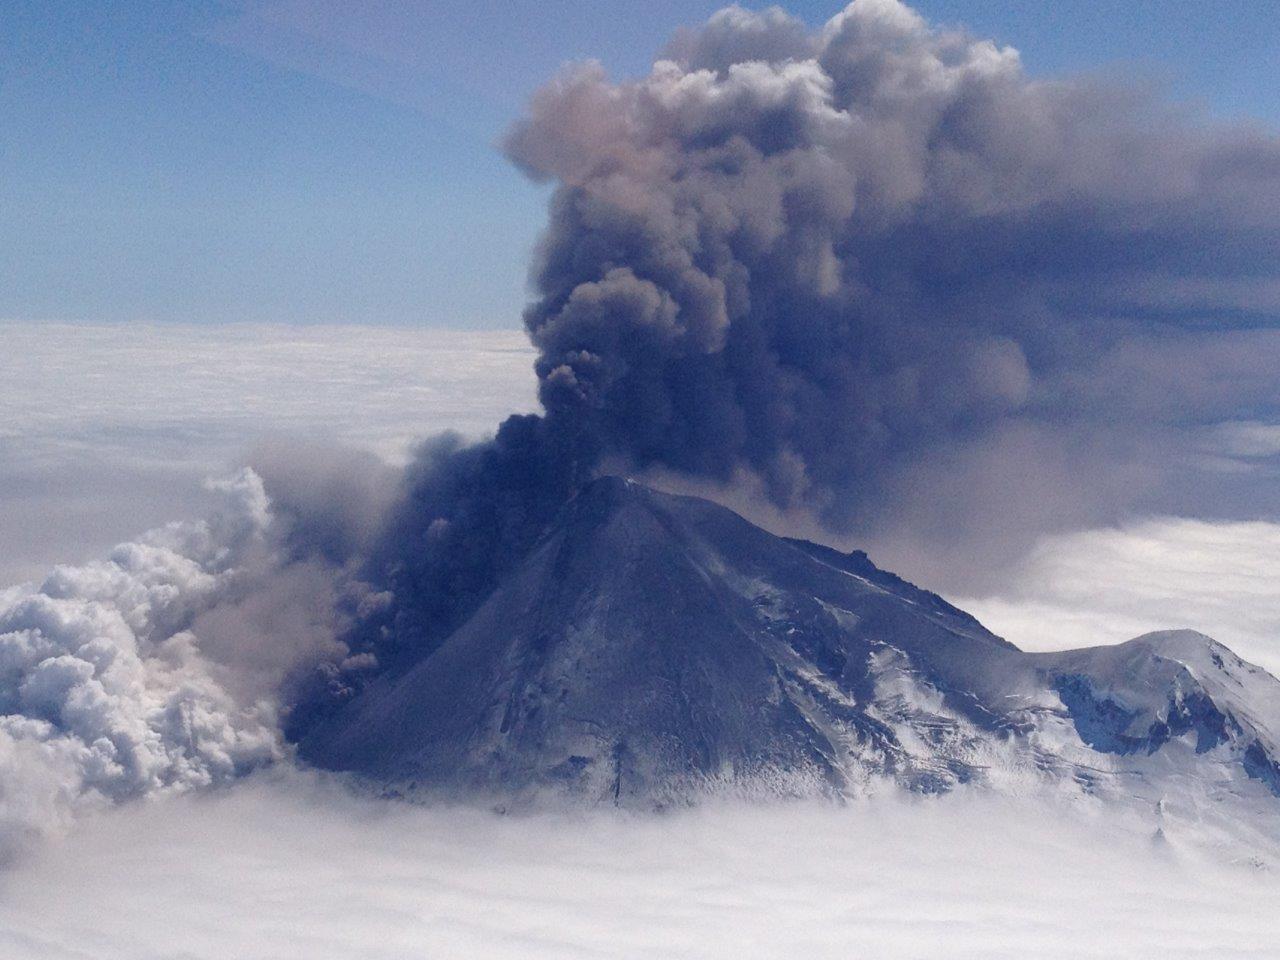 Alaska's Pavlof Volcano: NASA's View from Space